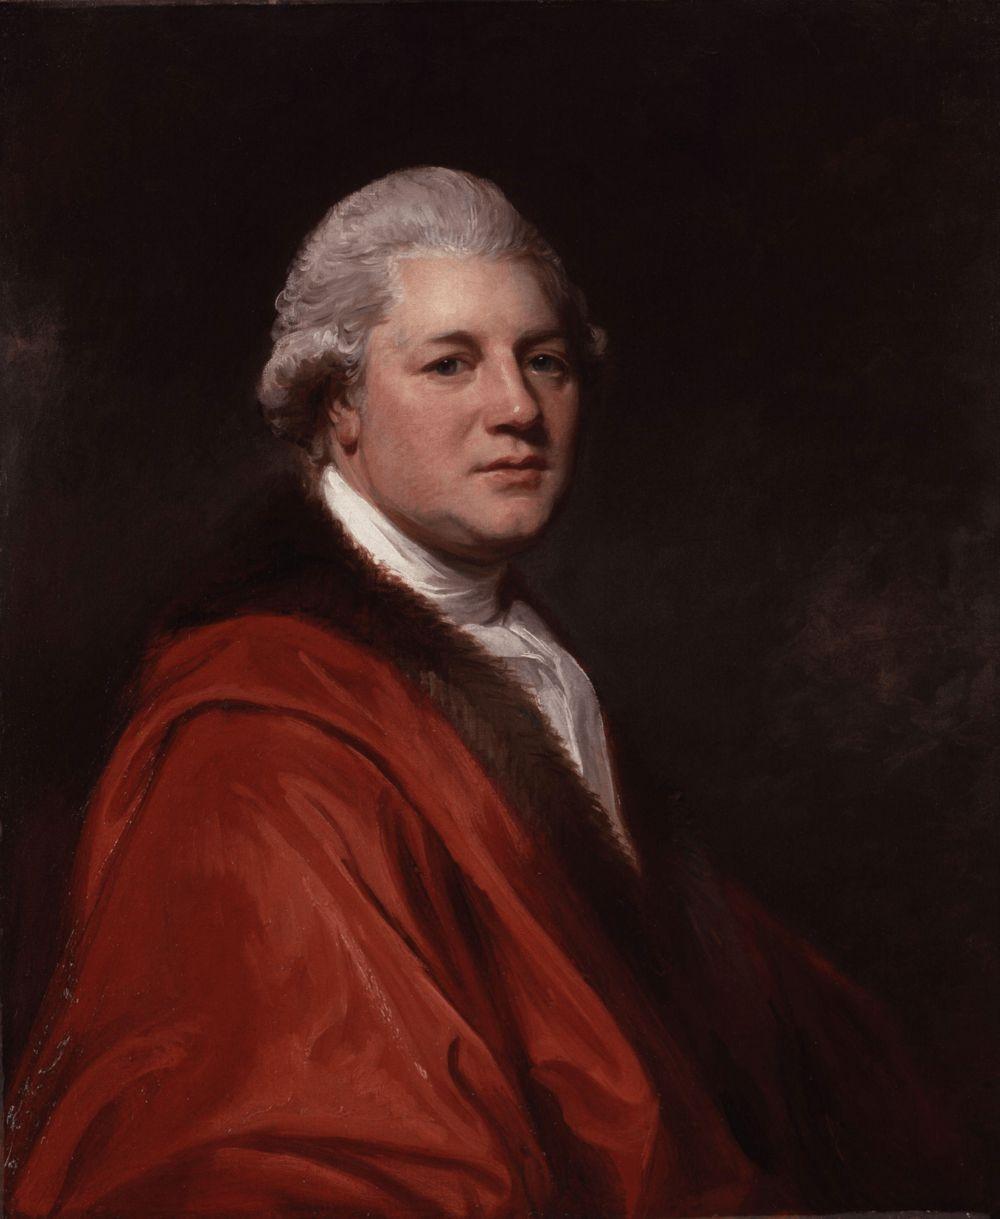 James Macpherson